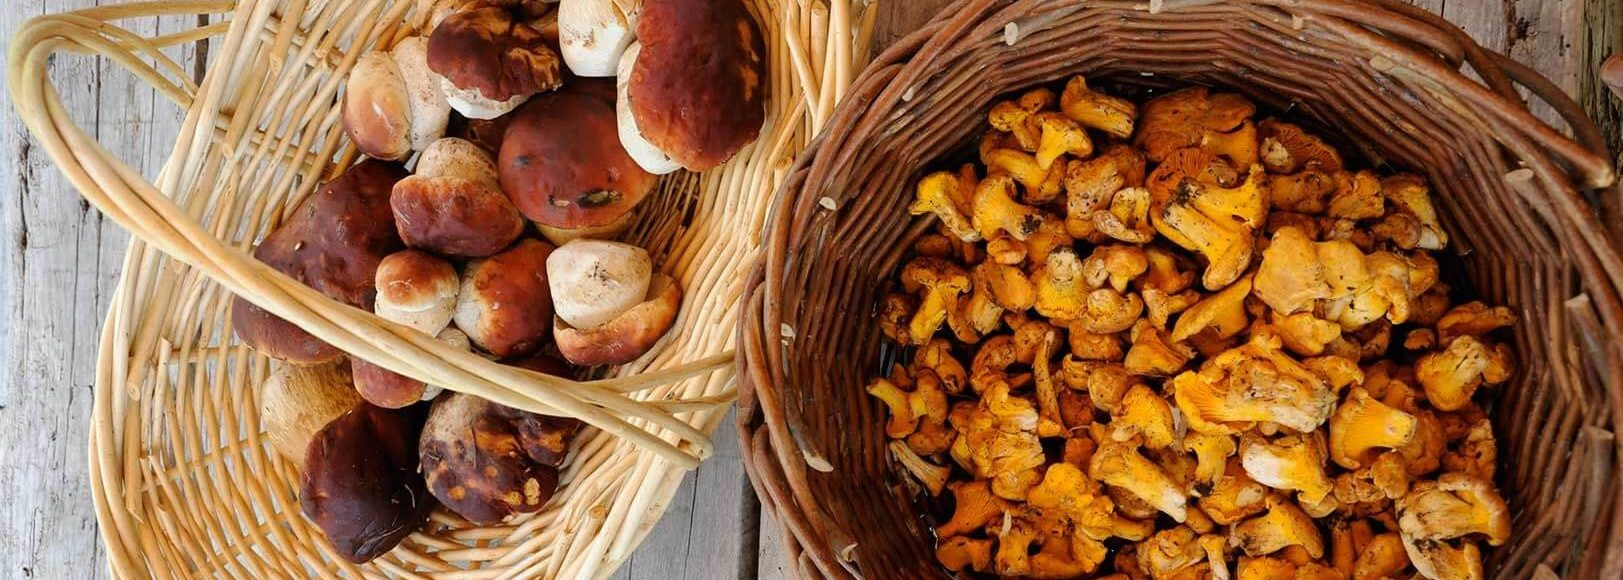 Gathered fresh, wild mushrooms in baskets